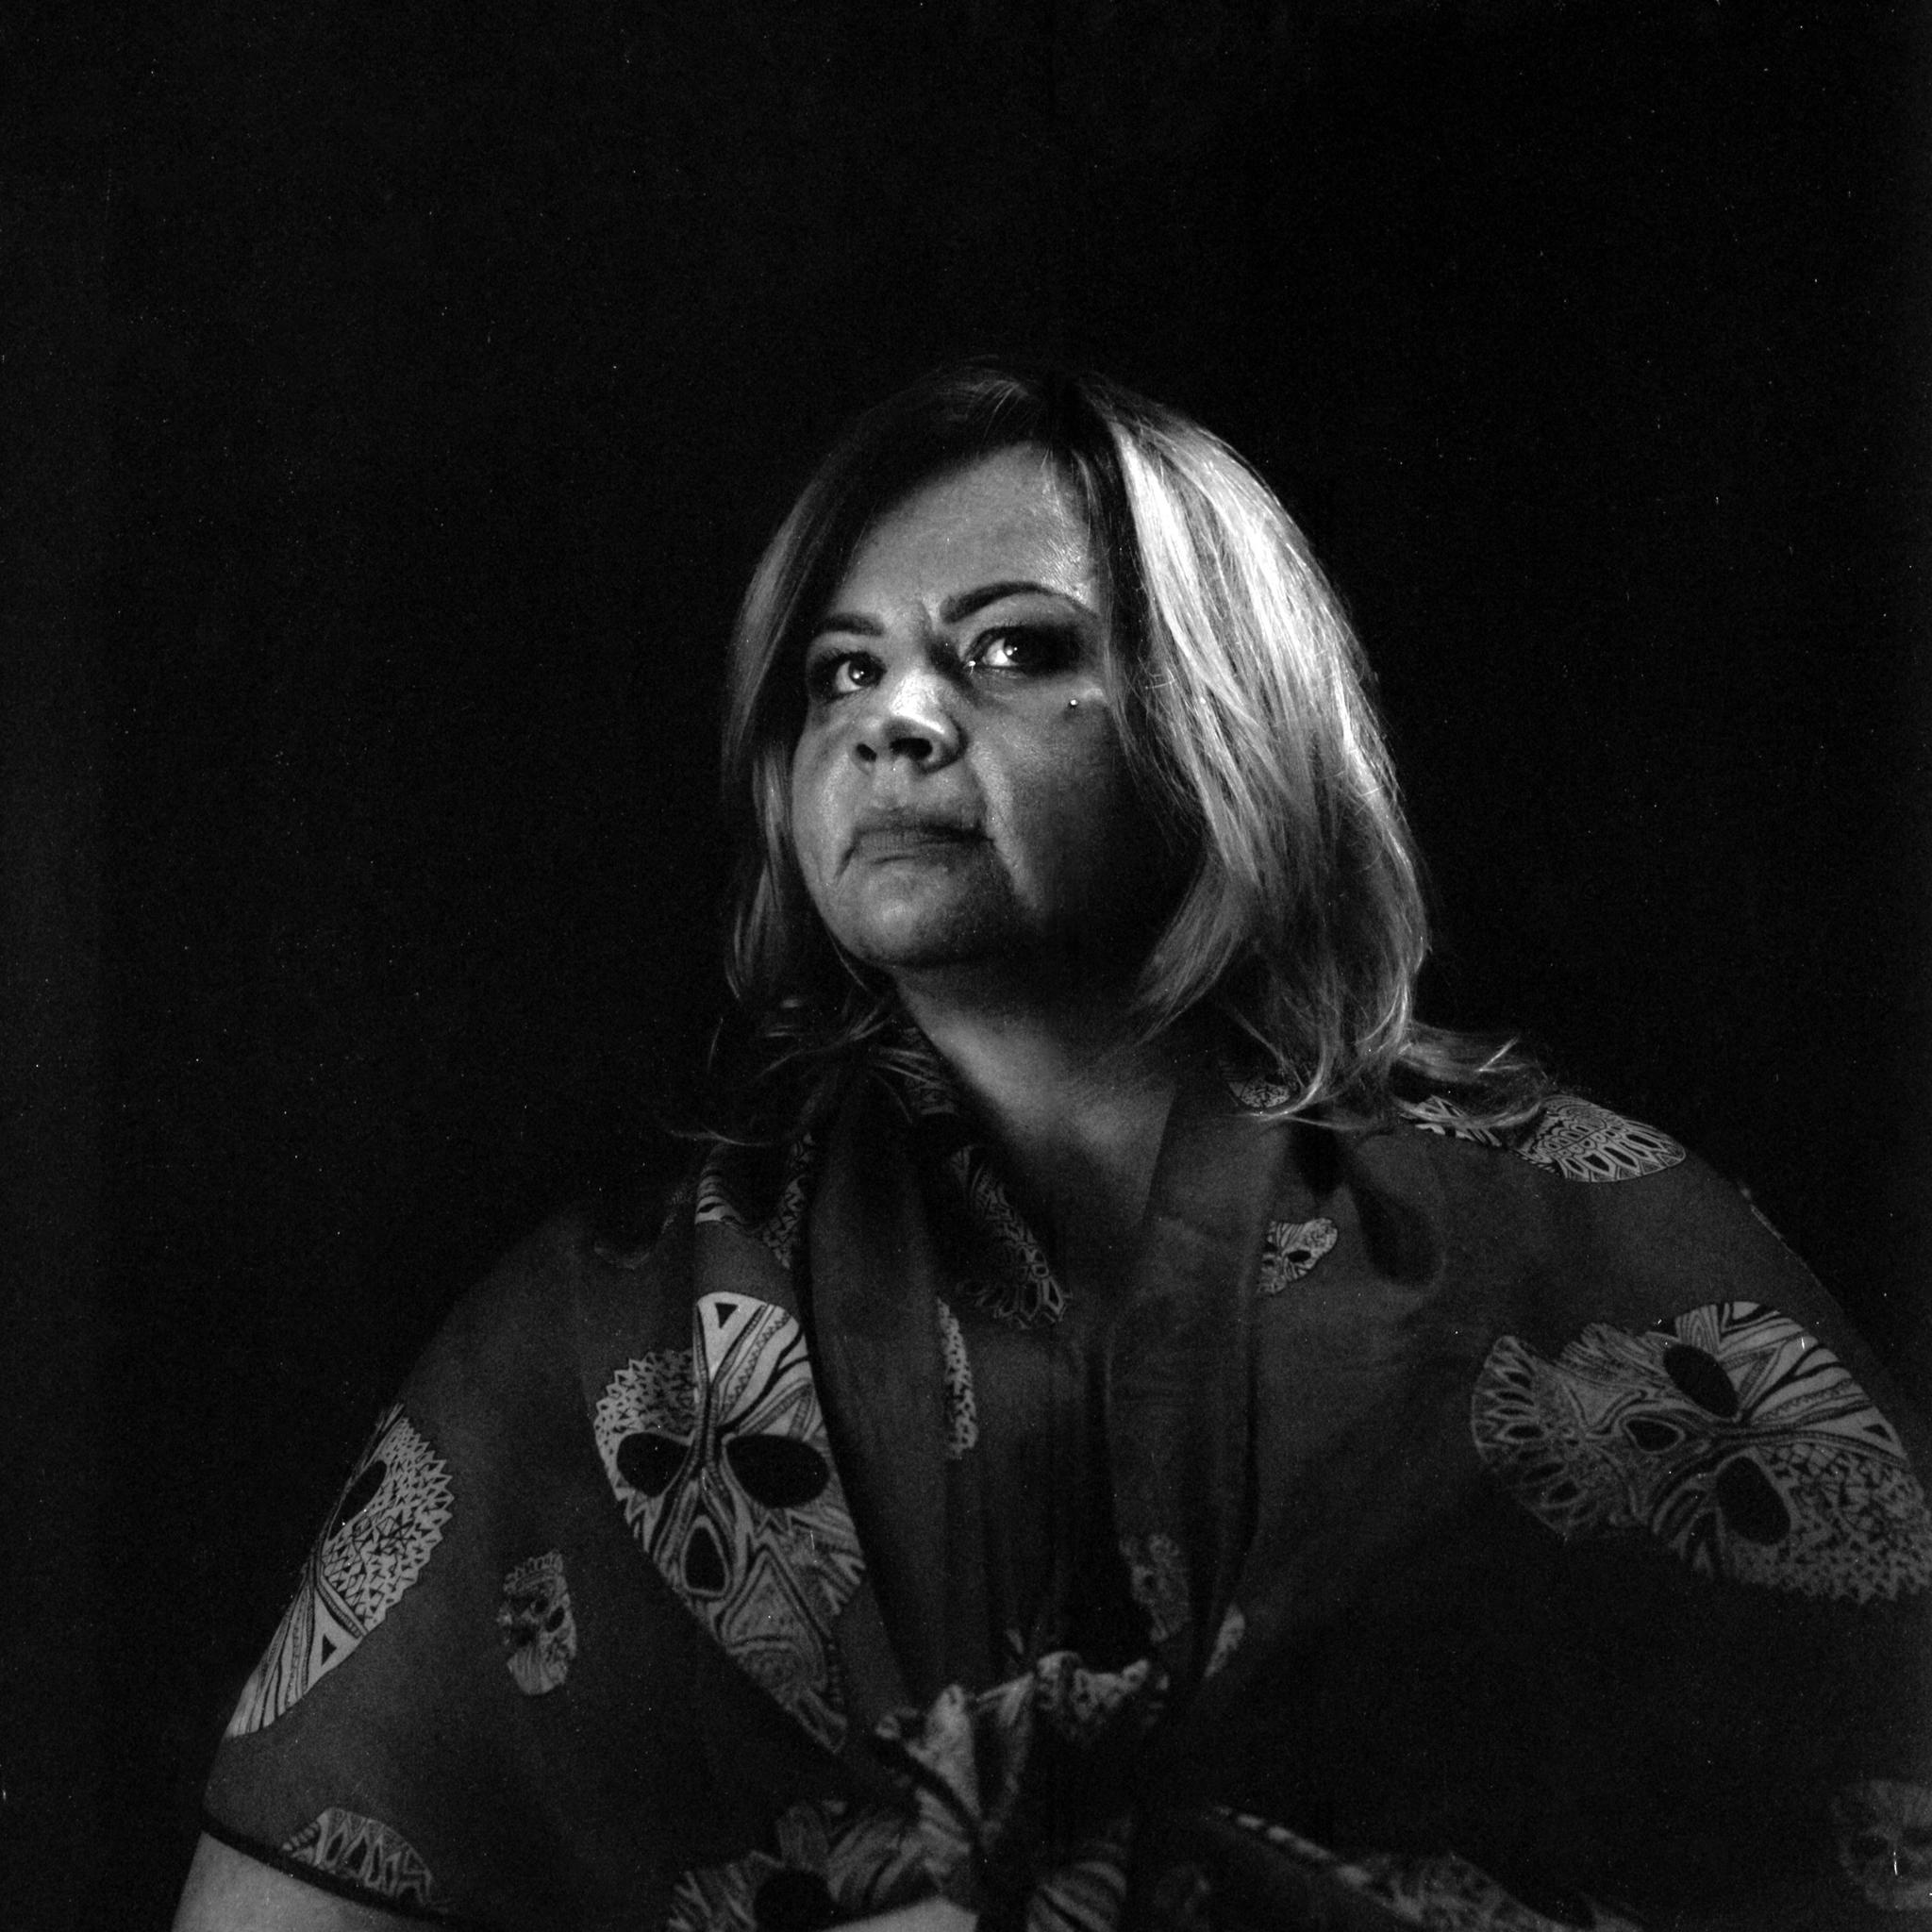 Black and white portrait (Pic: Iain Compton)